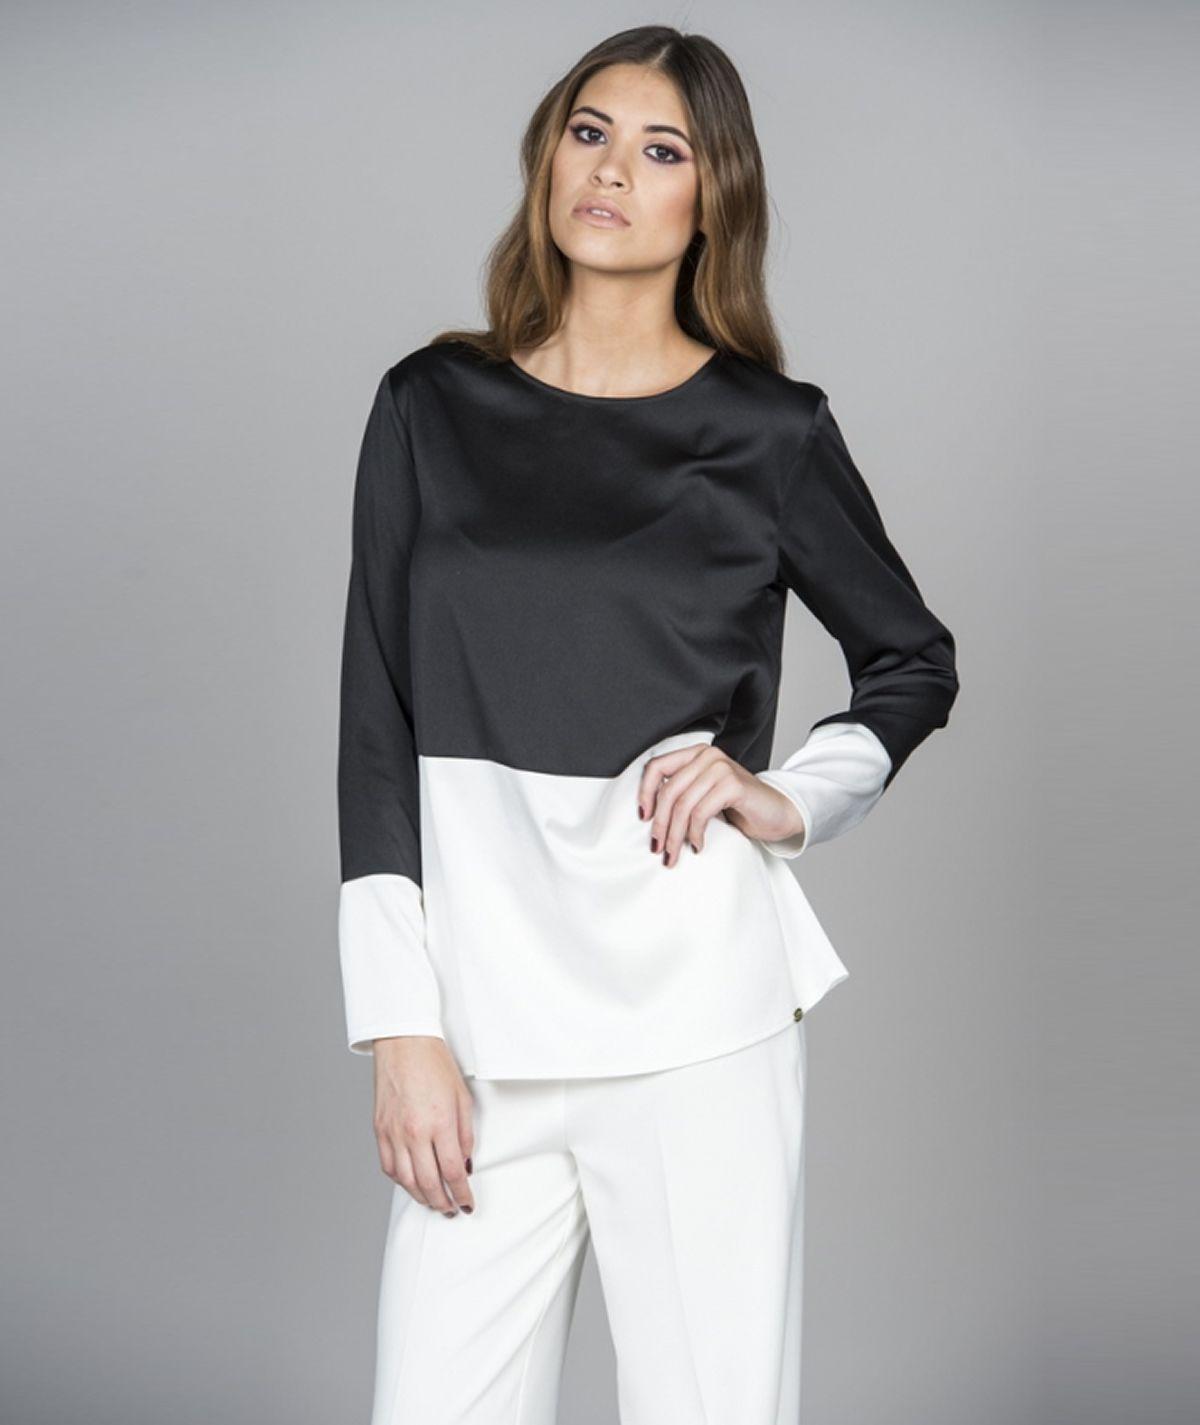 [CHIESSY] Blusa de duas cores